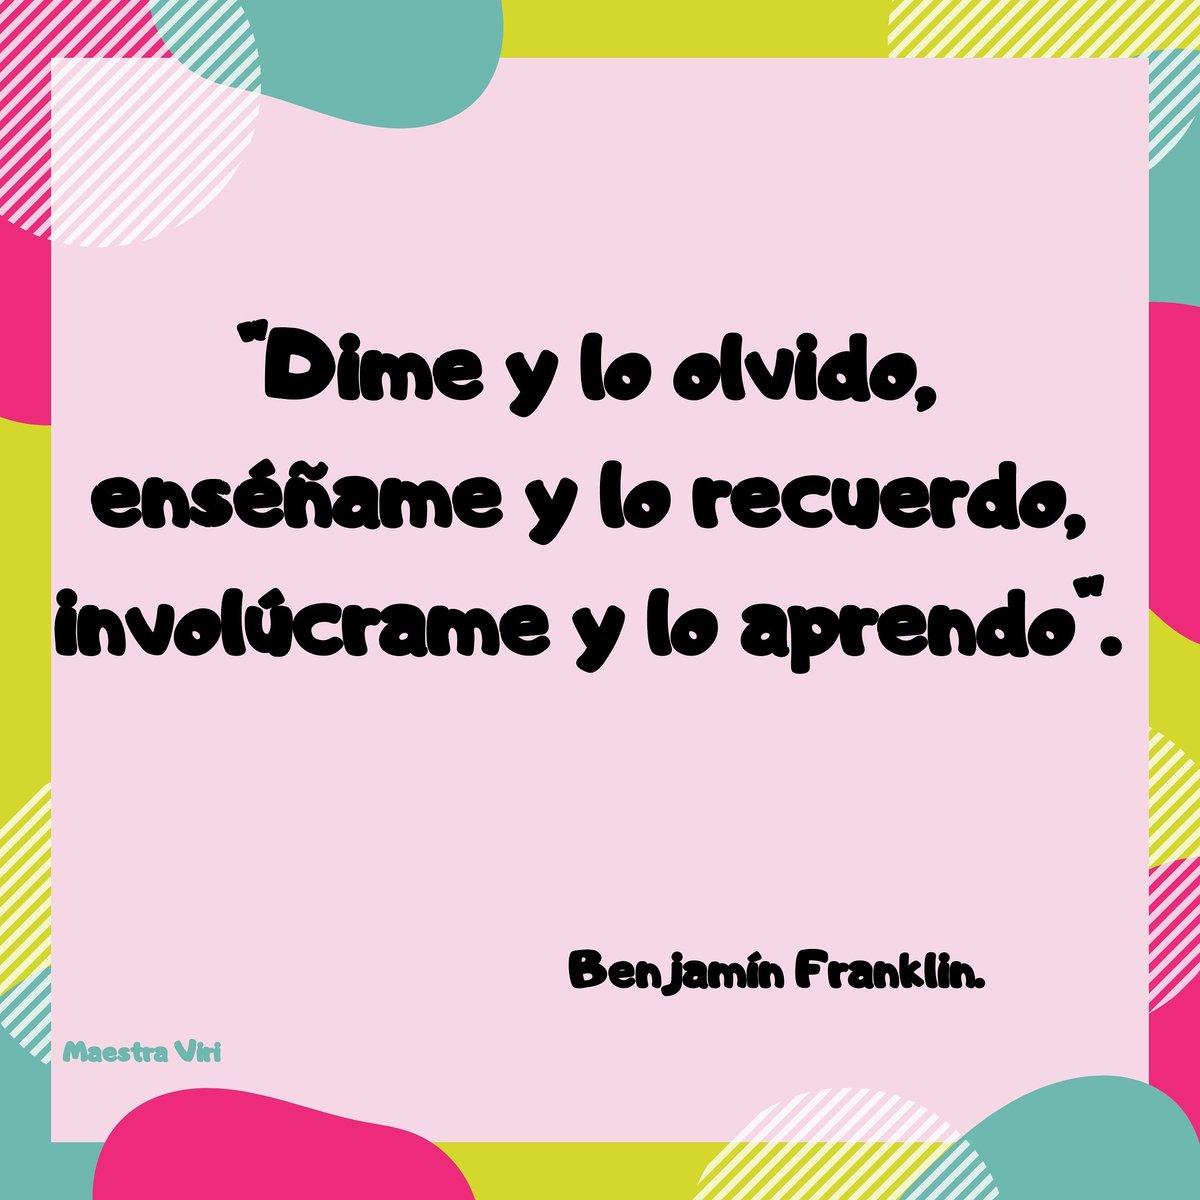 #quedateencasa #yomequedoencasa #actividadesparaniños #MaestraViri #infantil #niñosfelices #MaestraViri #COVIDー19 #CuarentenaInteligente  #Educacionpic.twitter.com/odwCJH2n8D